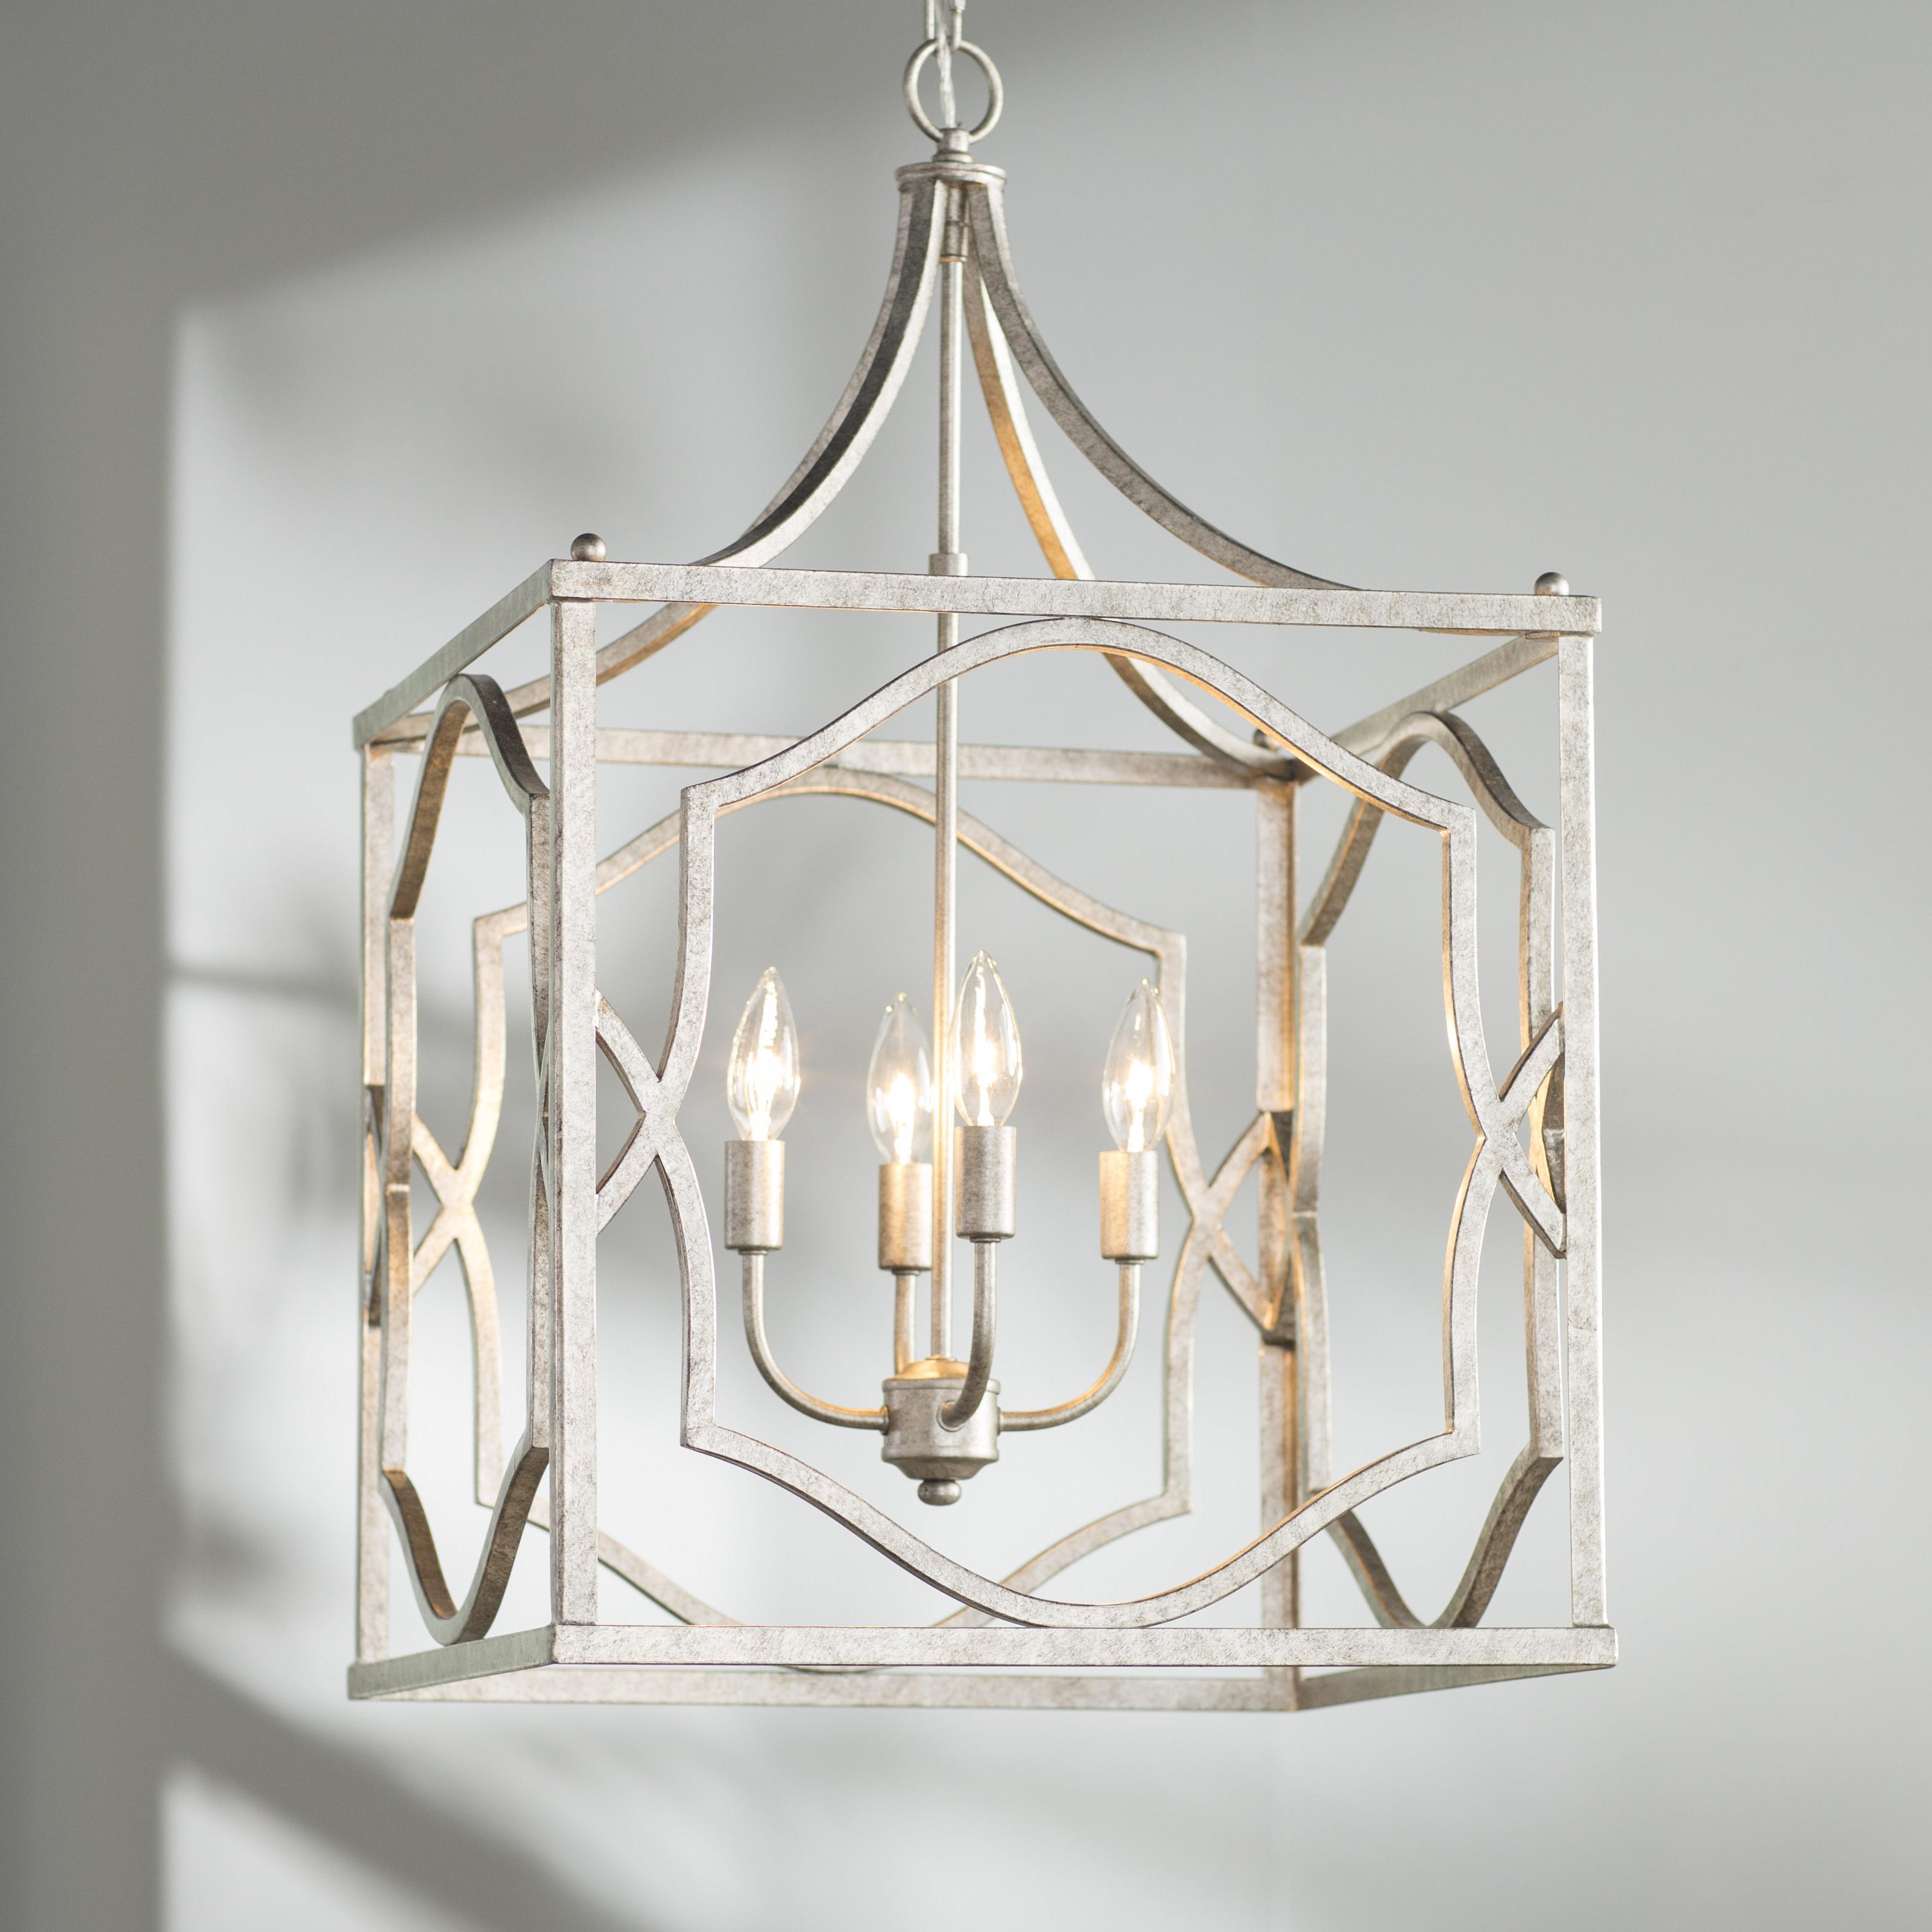 Destrey 3 Light Lantern Square/rectangle Pendants Throughout Latest Destrey 4 Light Lantern Square / Rectangle Pendant (Gallery 2 of 25)